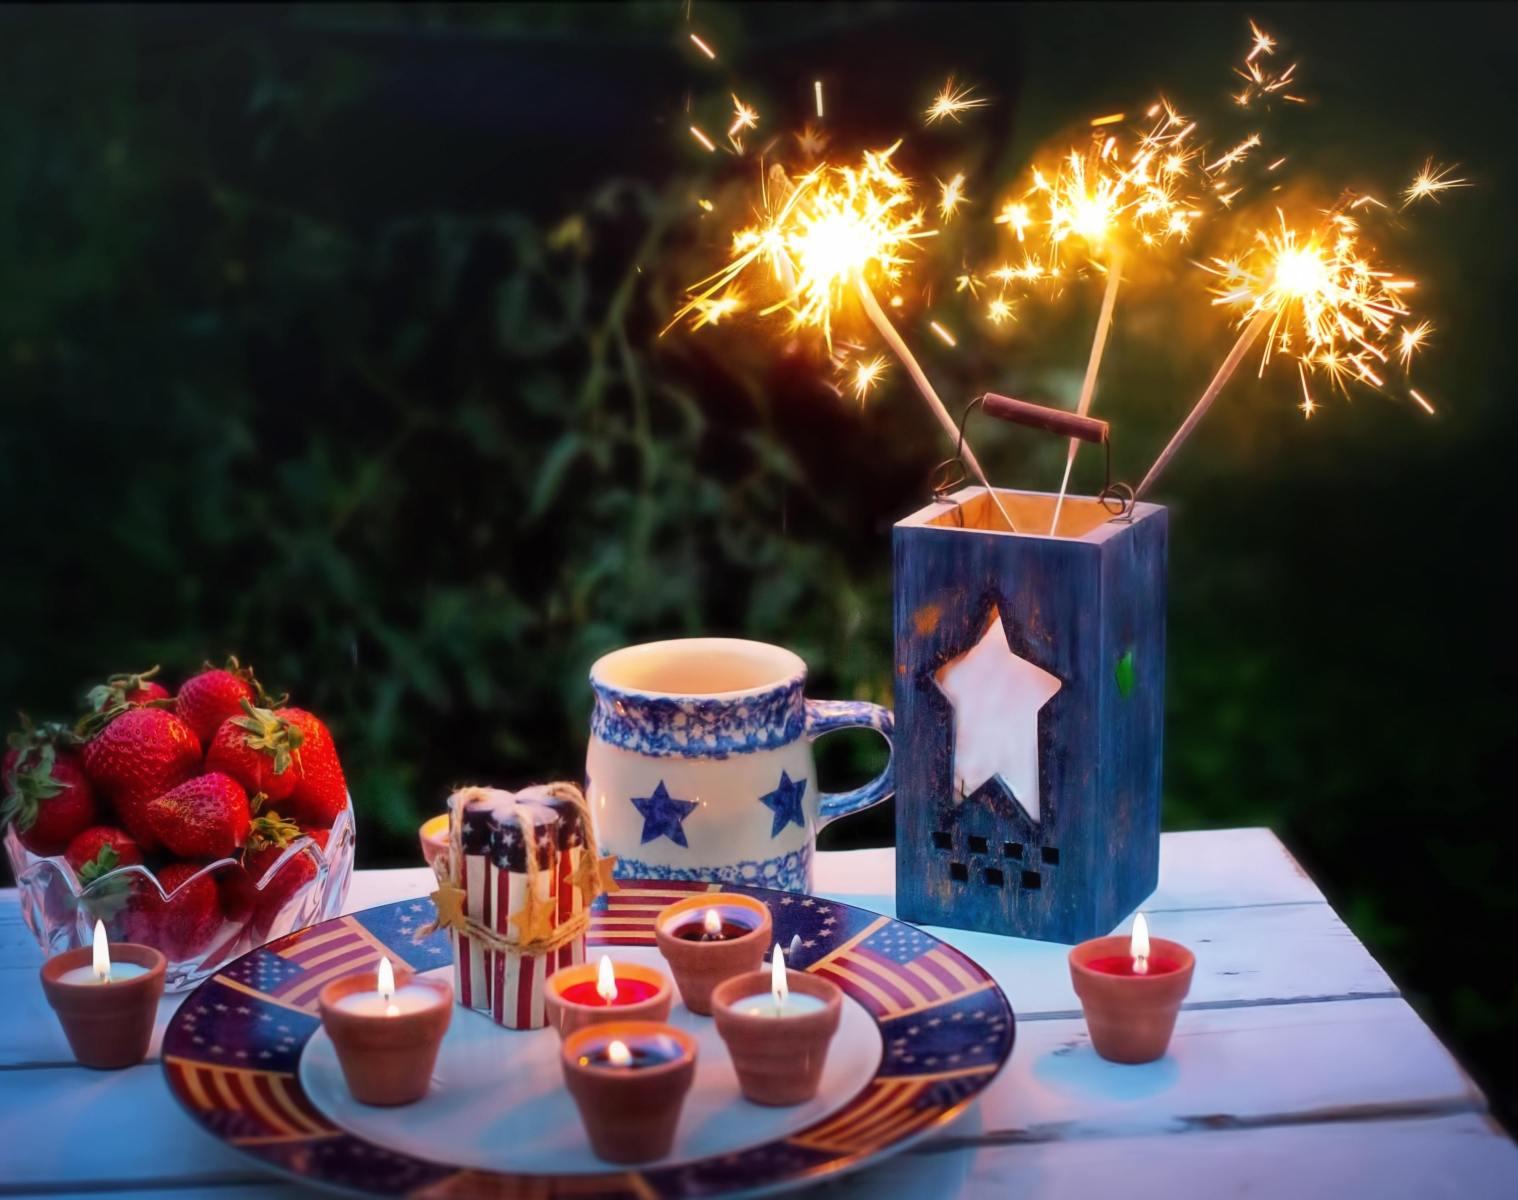 bright-candles-celebrate-461917.jpg